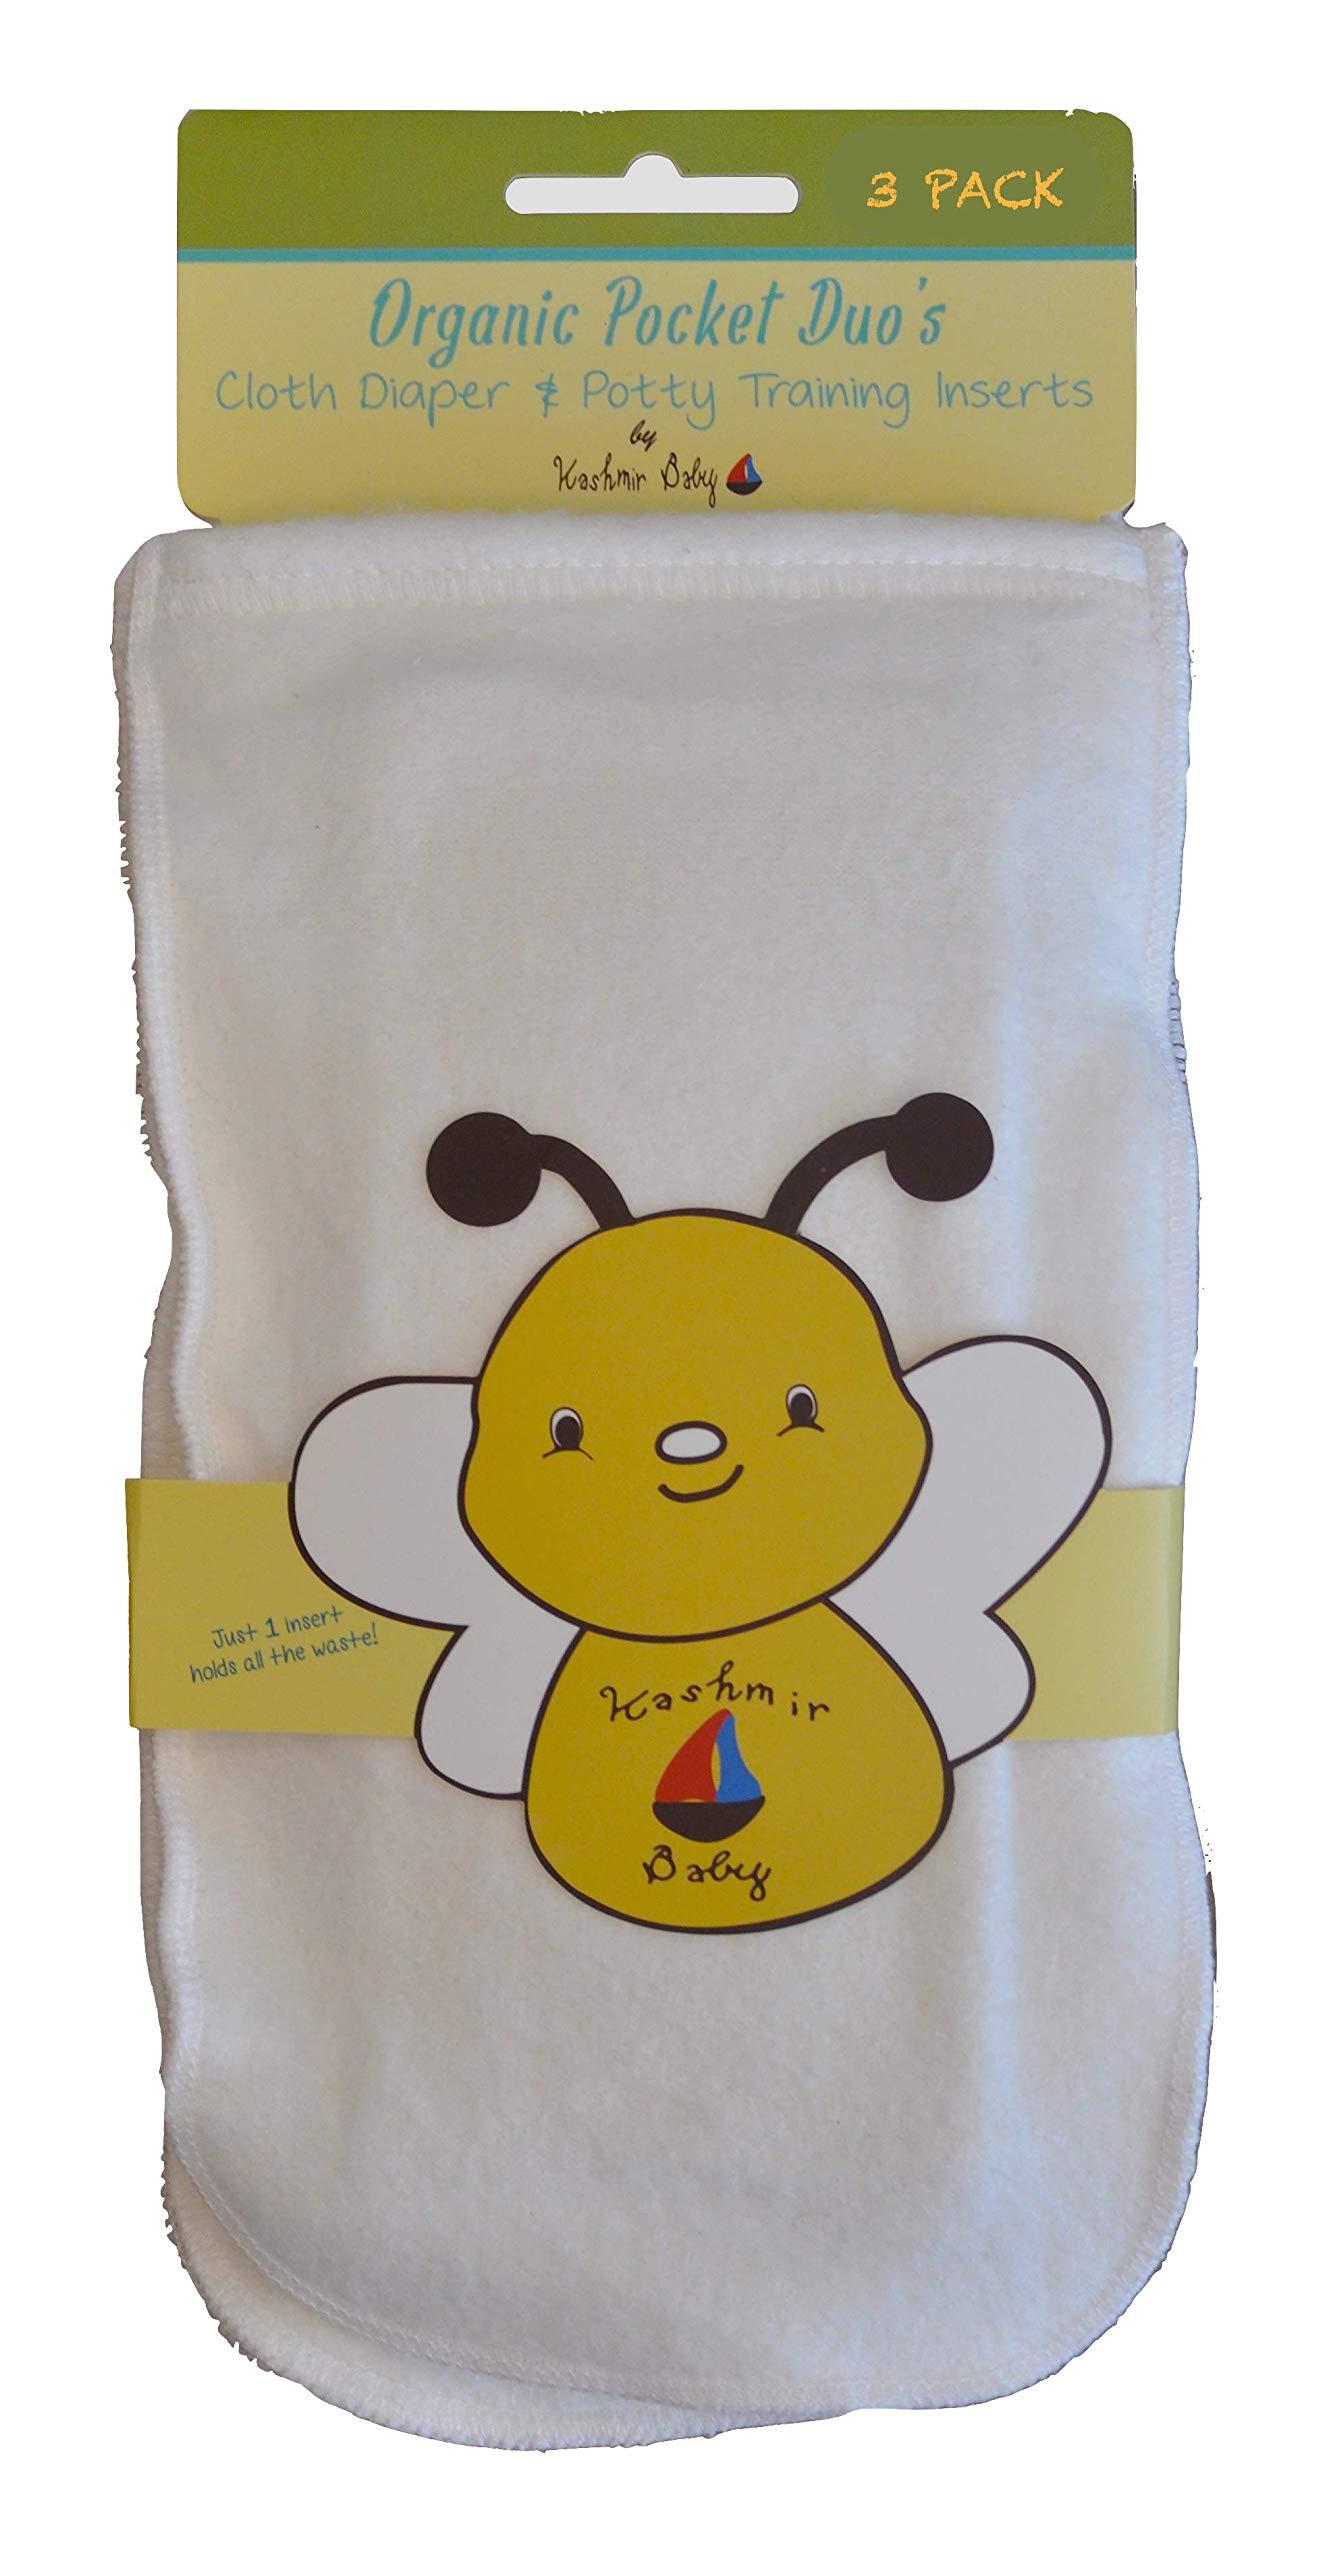 Kashmir Baby 3 Pk Bamboo/Organic Cotton Cloth Diaper Plus Potty Training Inserts (3 Pack Large)